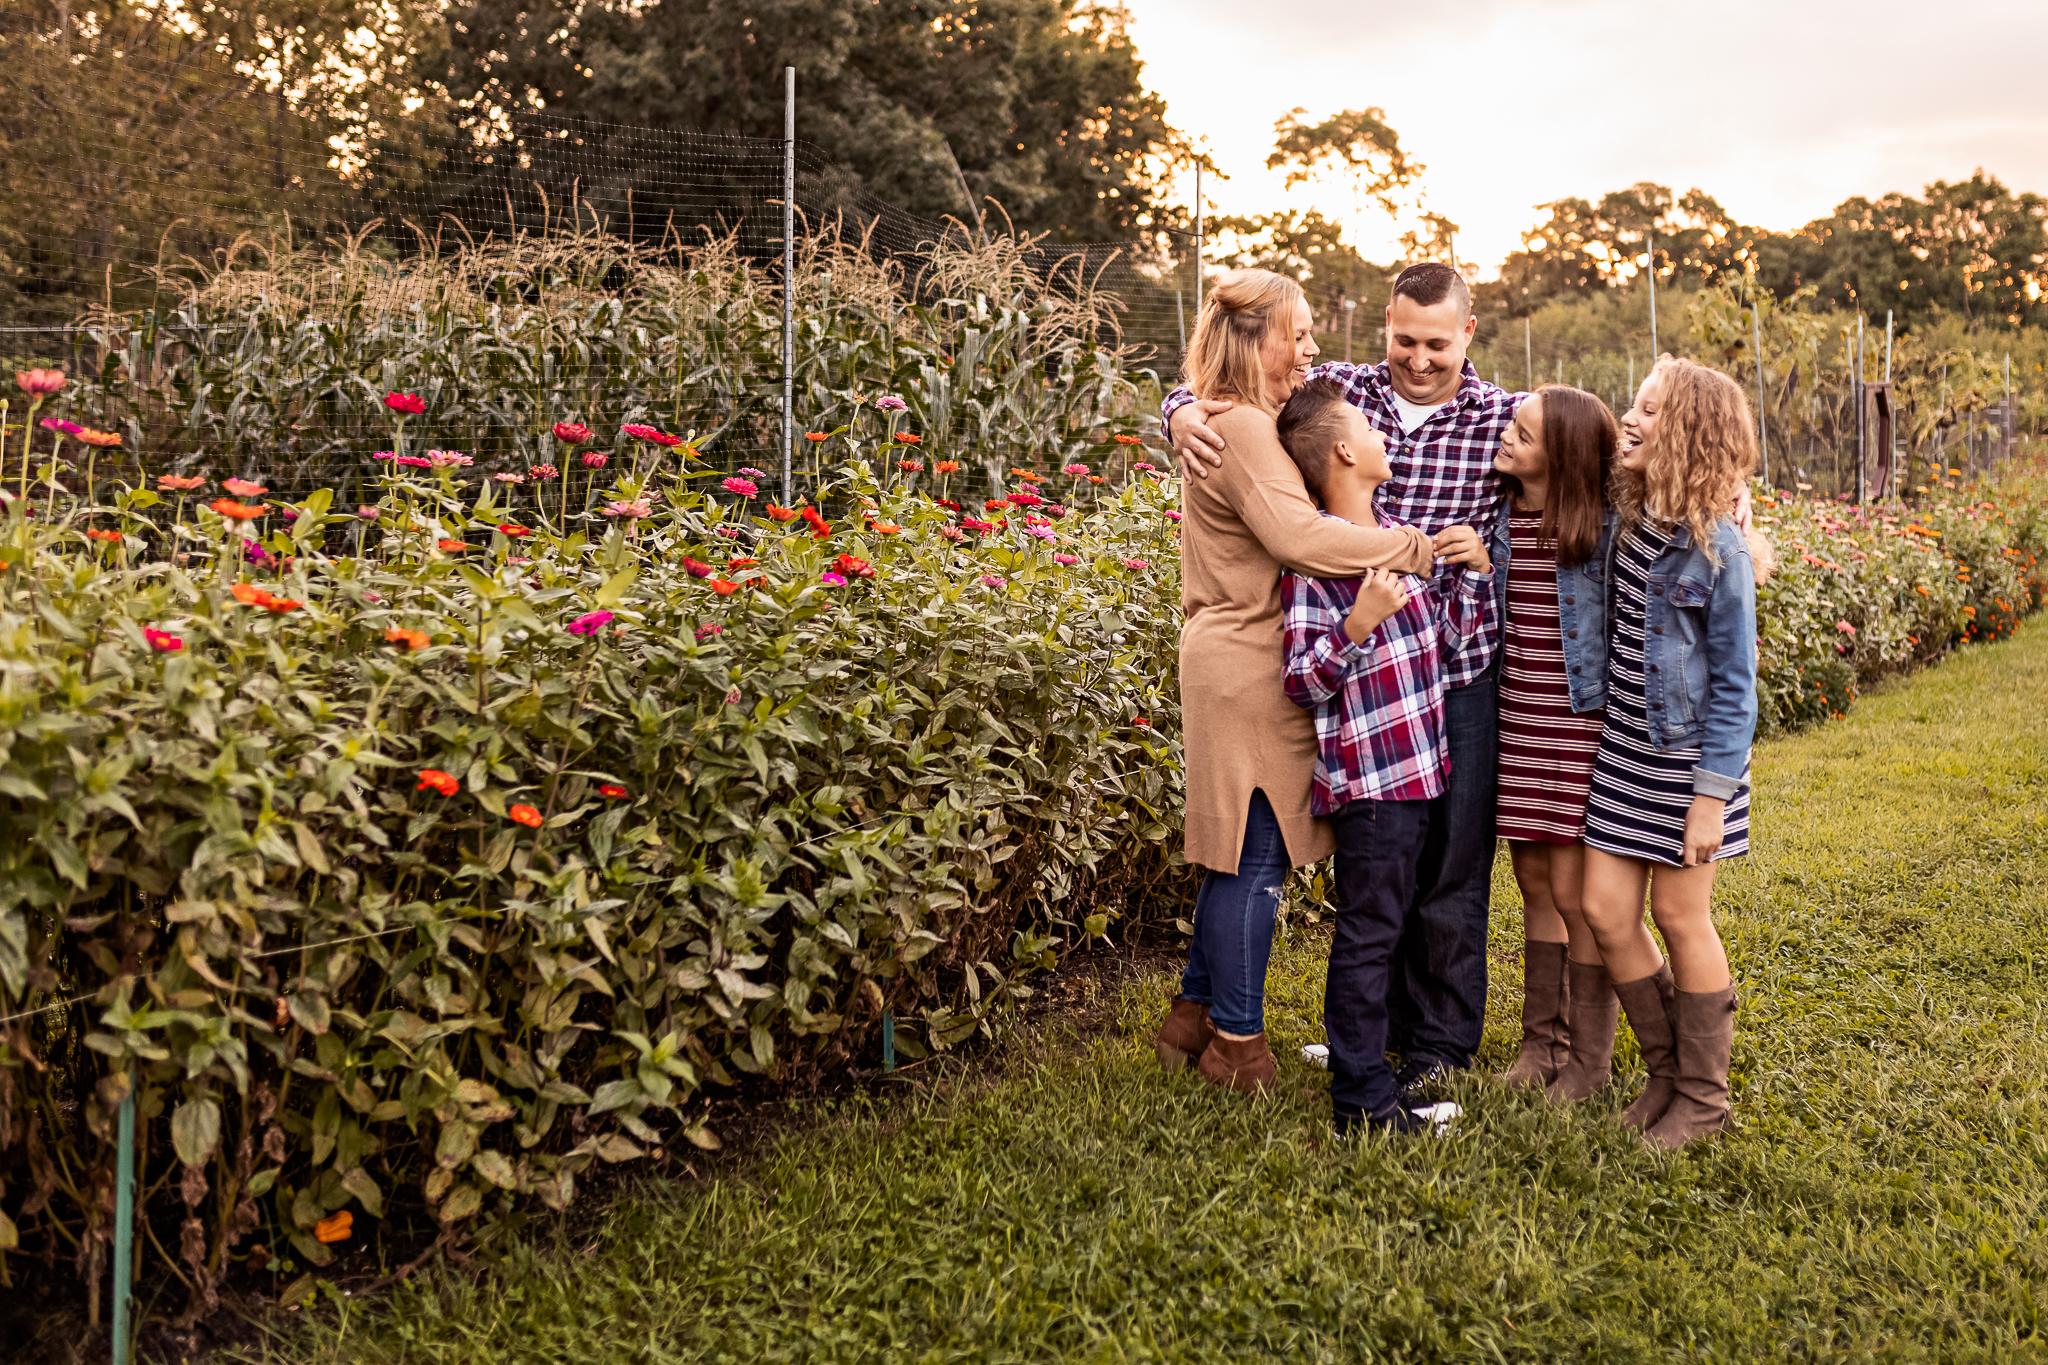 NancyElizabethPhotography, South Jersey Photographer, Family Hug By Flowers